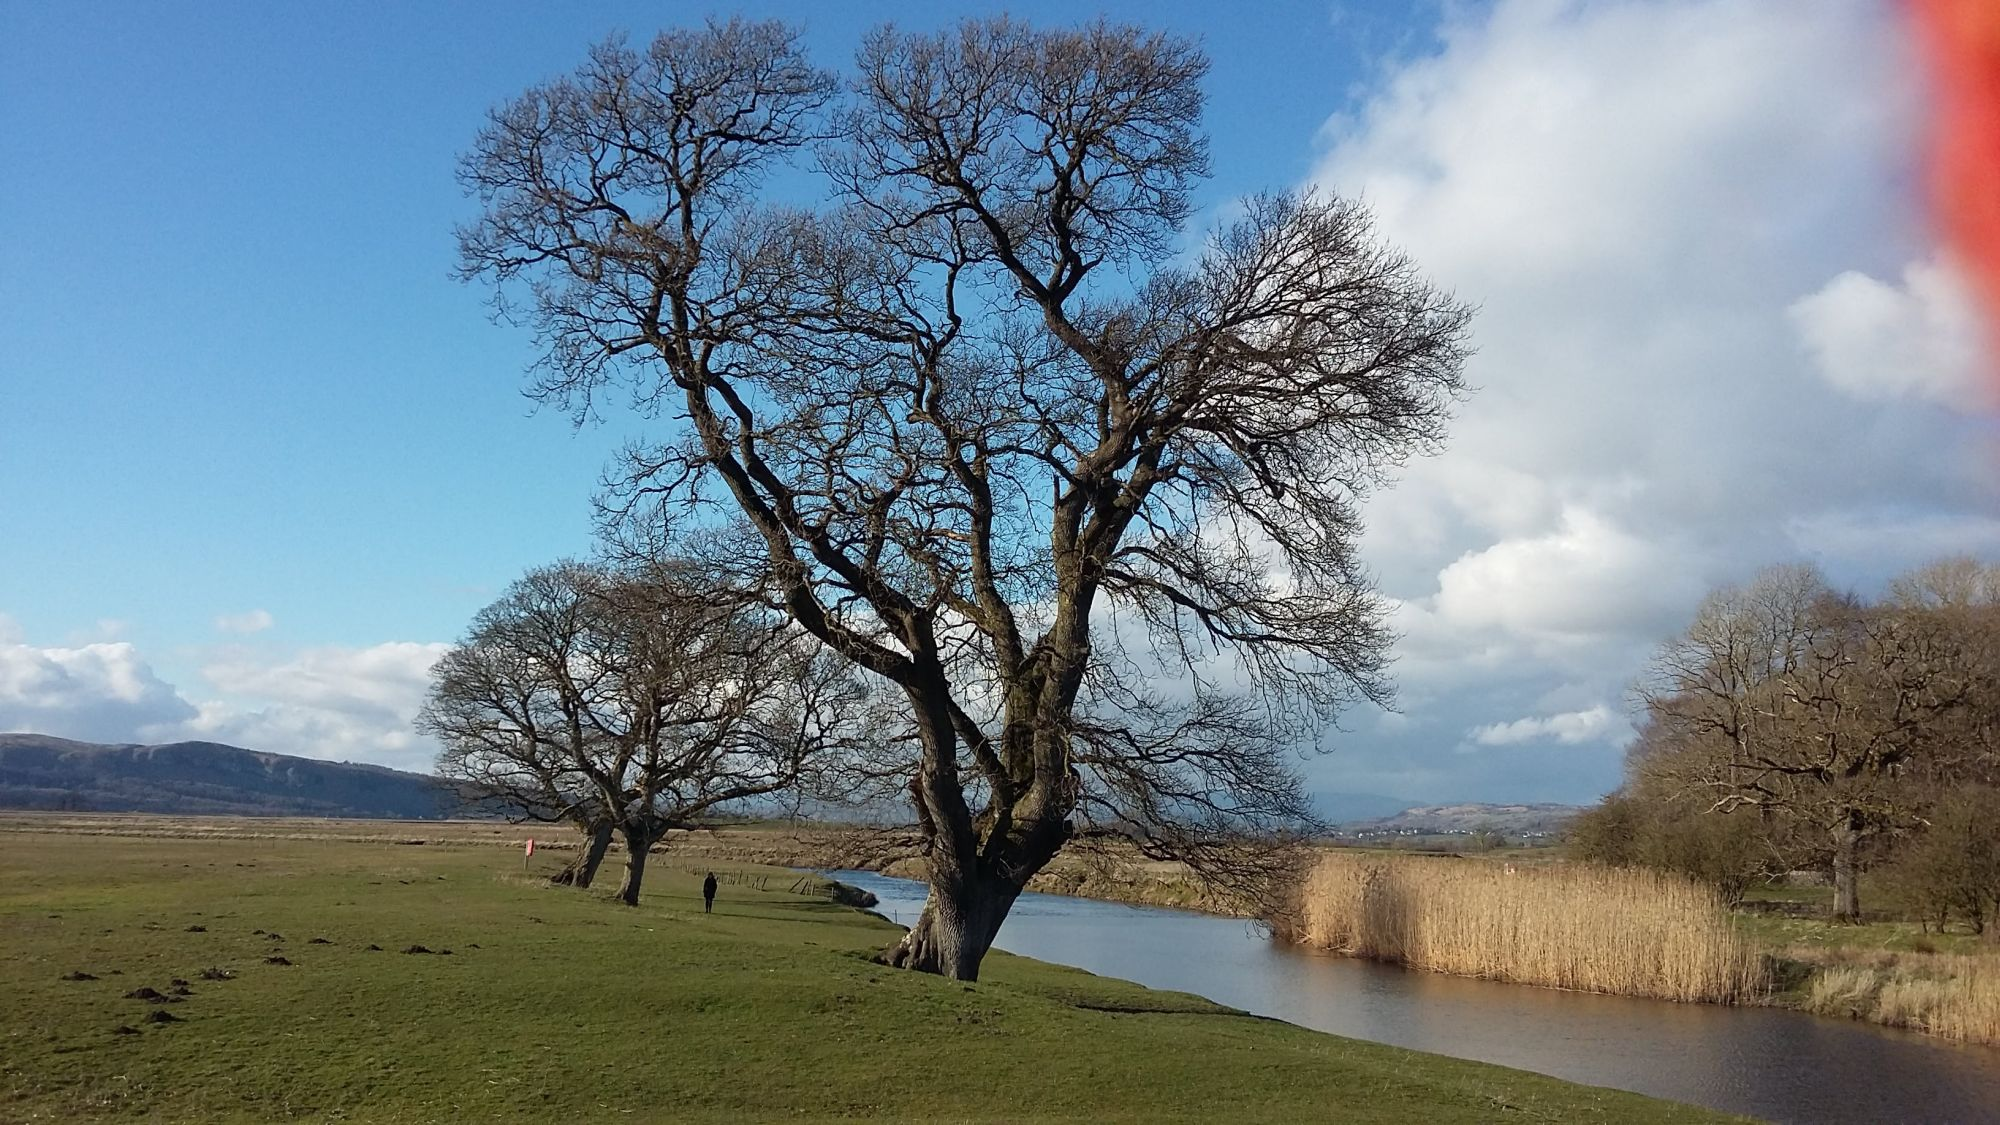 milnthorpe-sands-tree